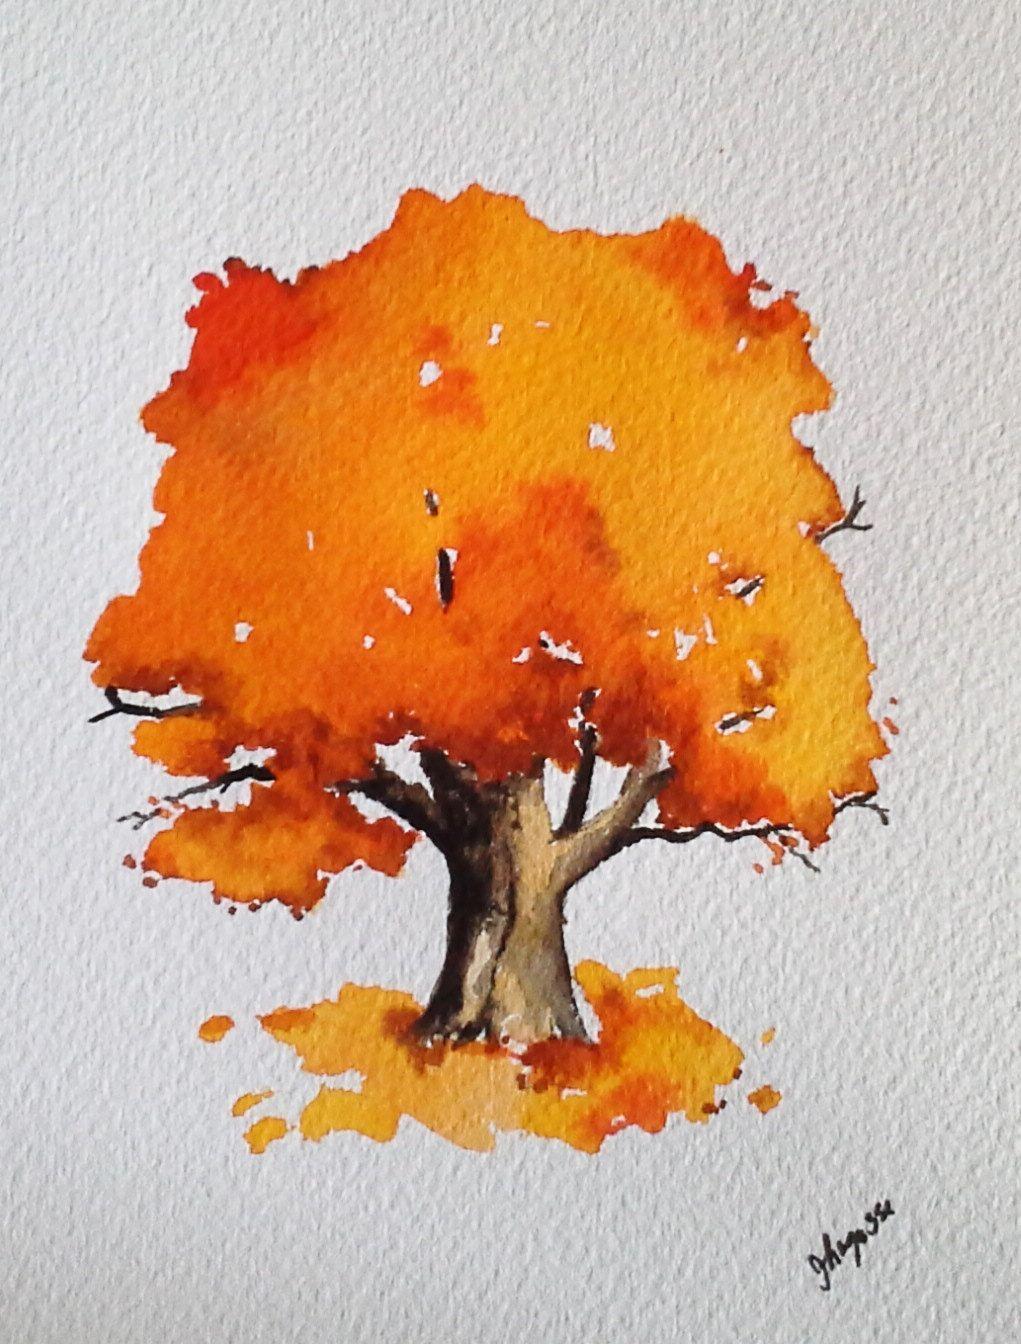 Watercolorsforlandlubbers Watercolor Original Painting Autumn